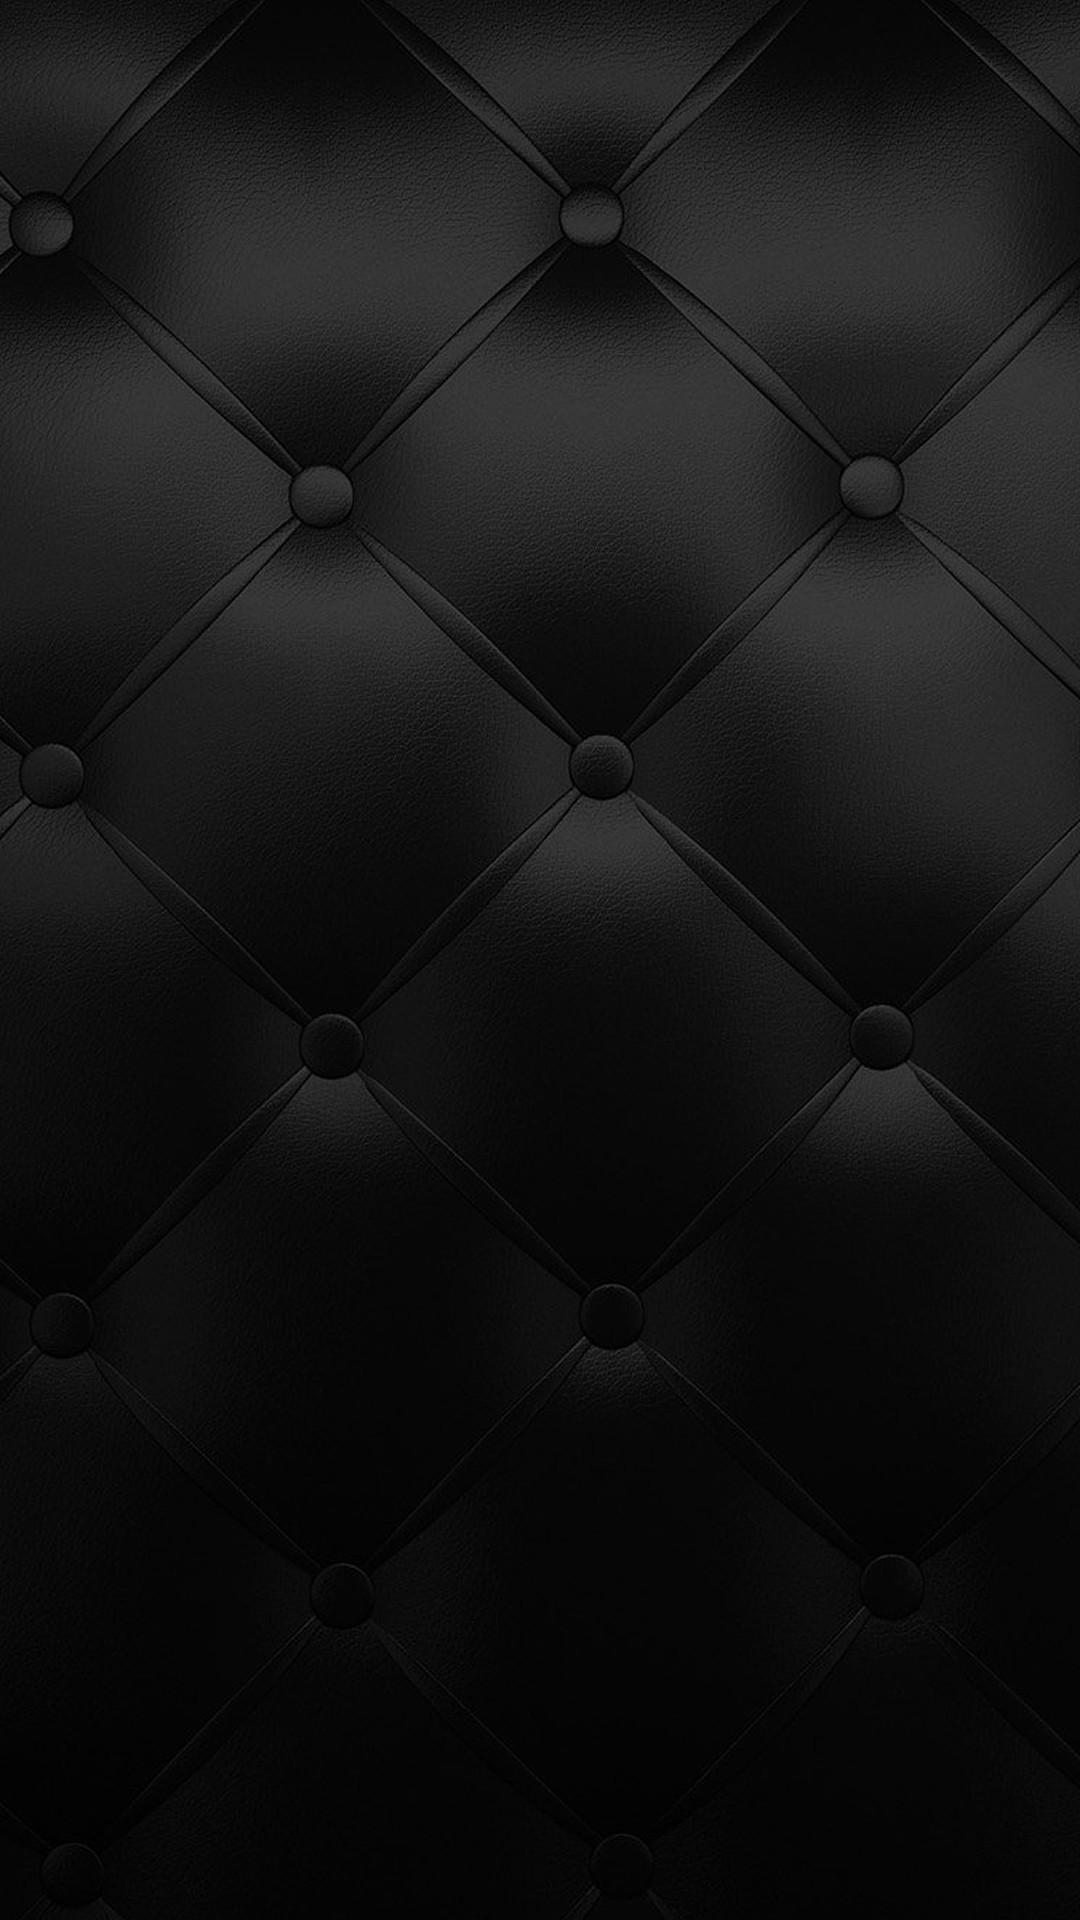 Cool Wallpaper Home Screen Black - 422628  Picture_76755.jpg